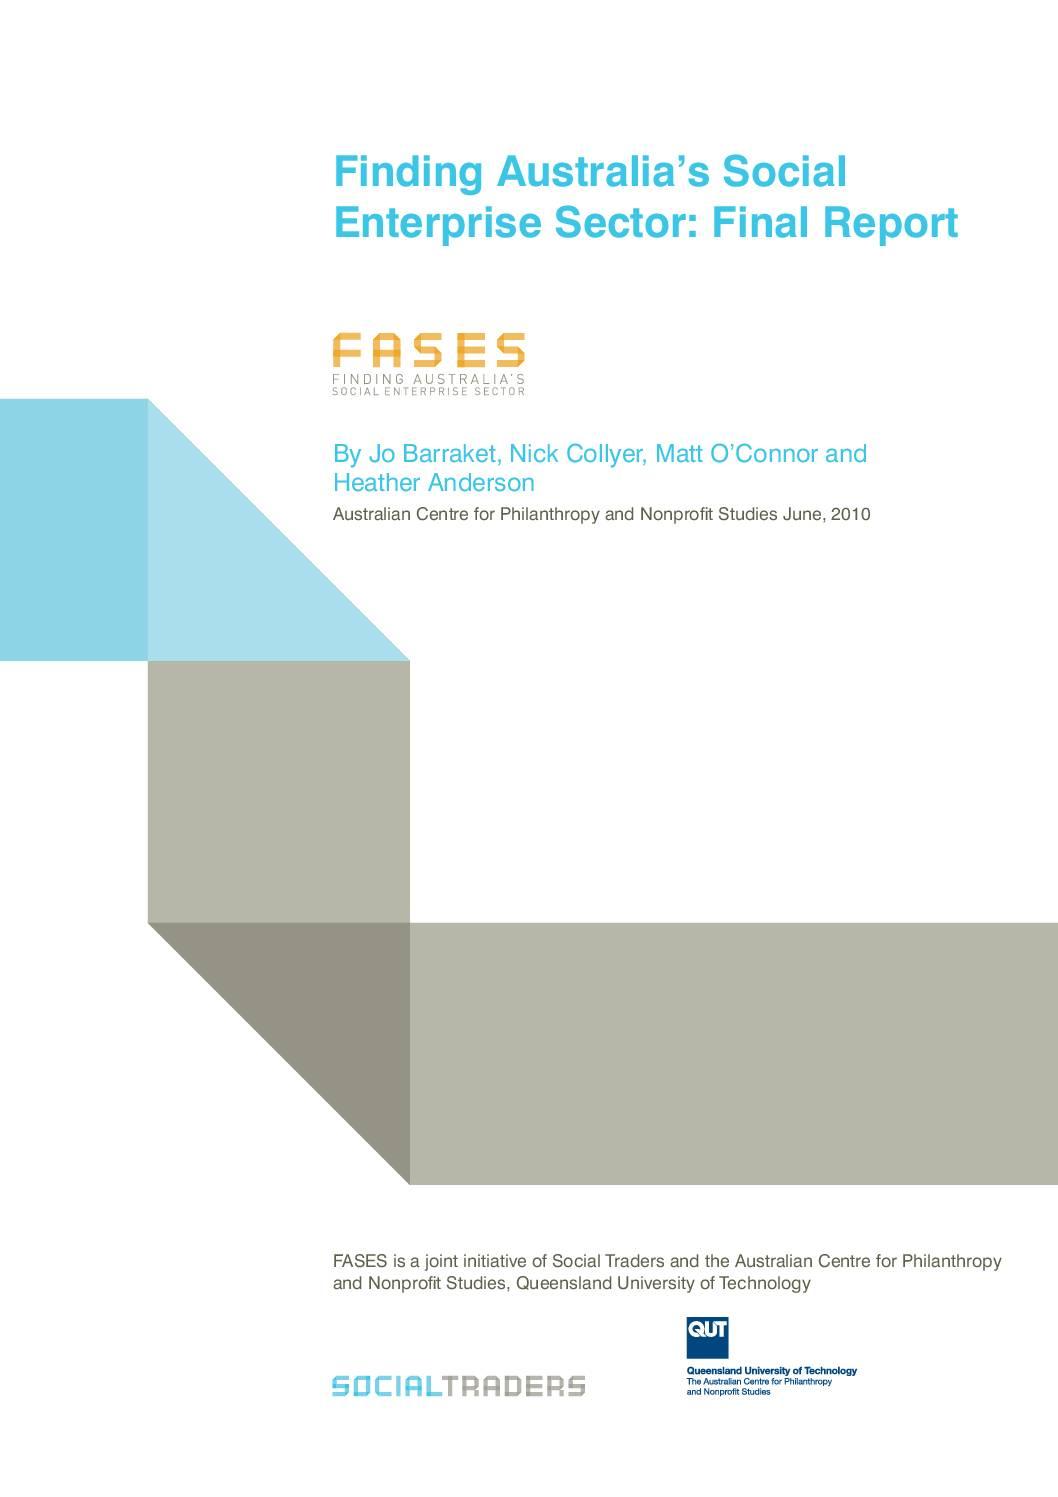 Finding Australia's Social Enterprise Sector